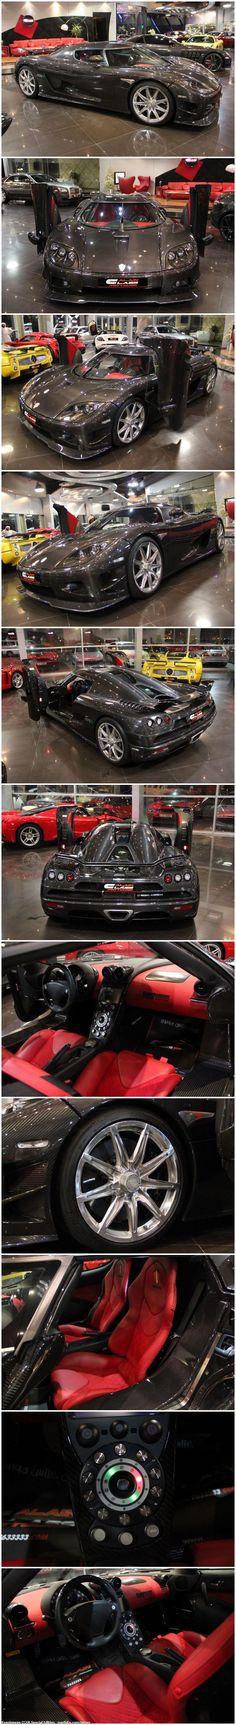 Visit The MACHINE Shop Café... ❤ The Best of Koenigsegg... ❤ (Koenigsegg CCXR Special Edition)